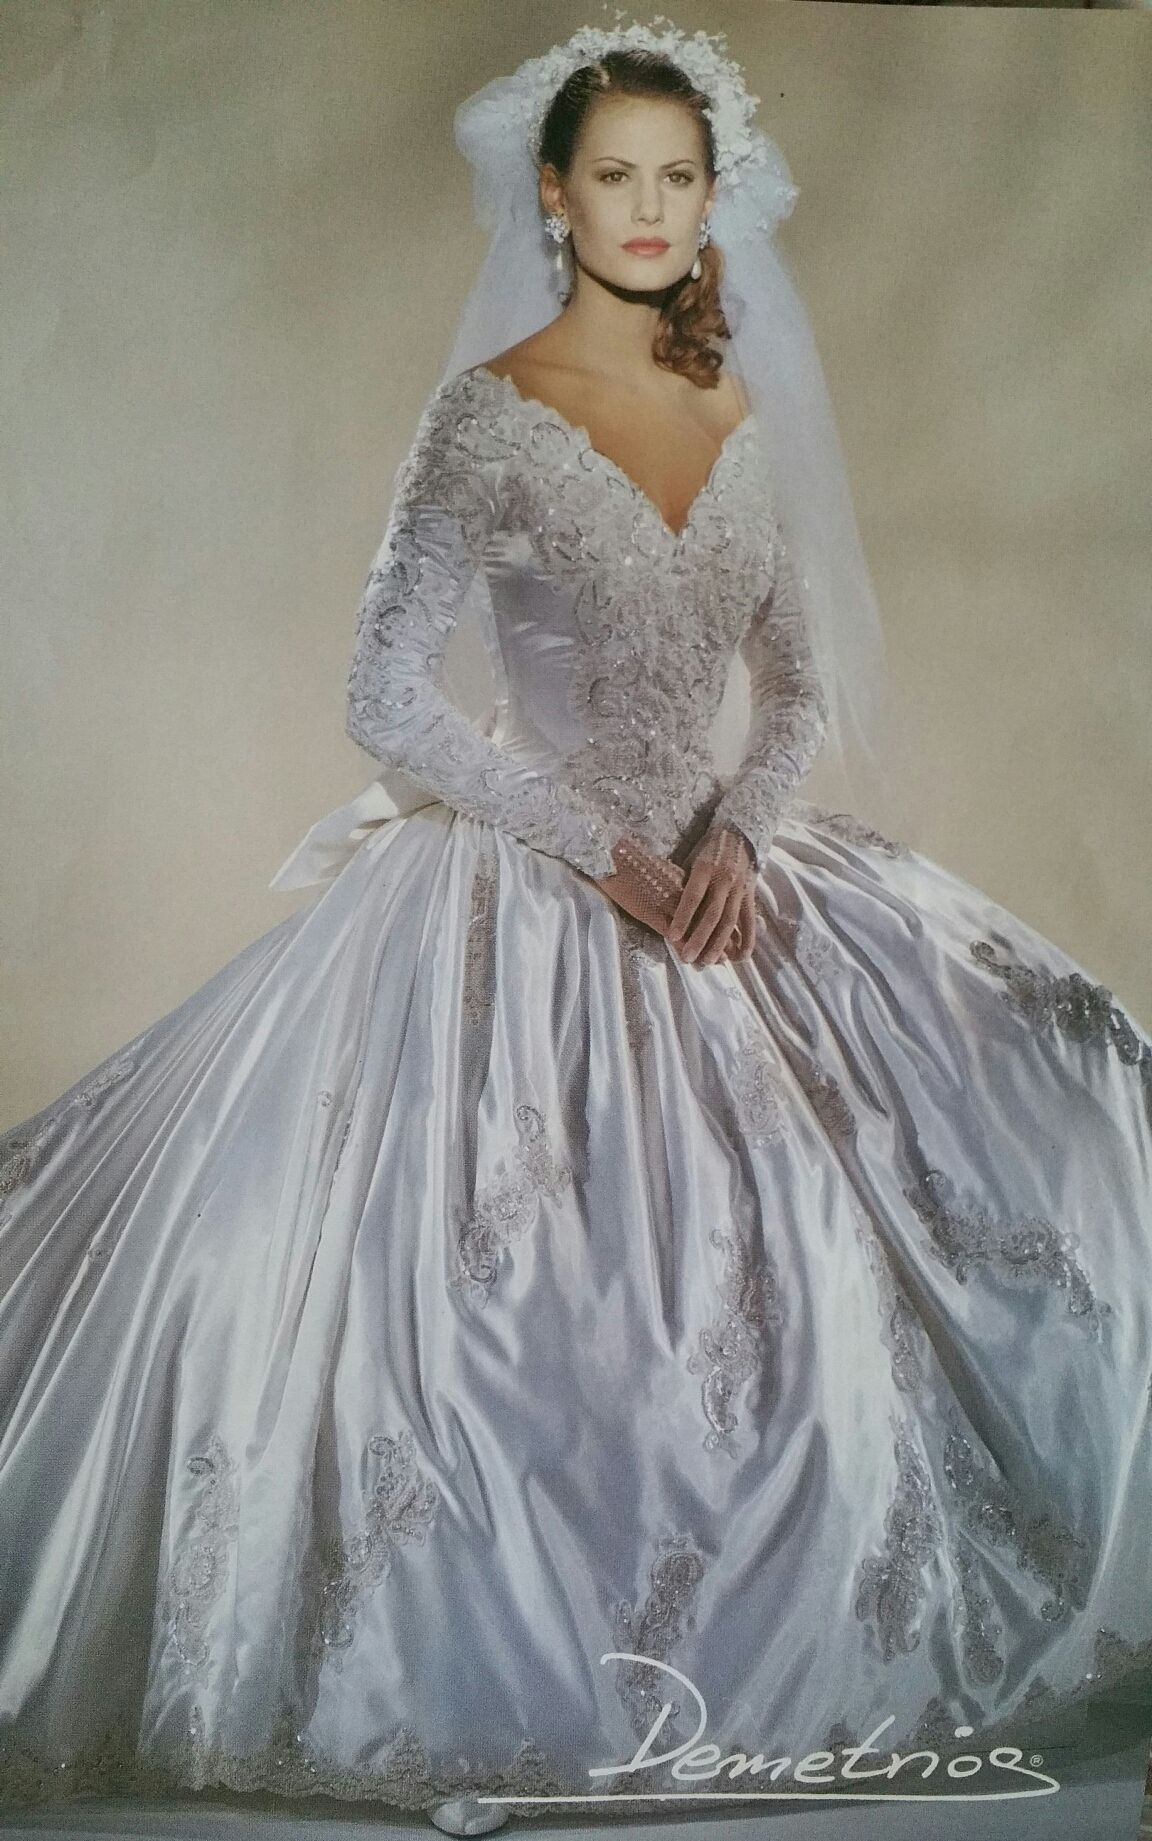 Demetrios us wed Pinterest Gowns Wedding dress and